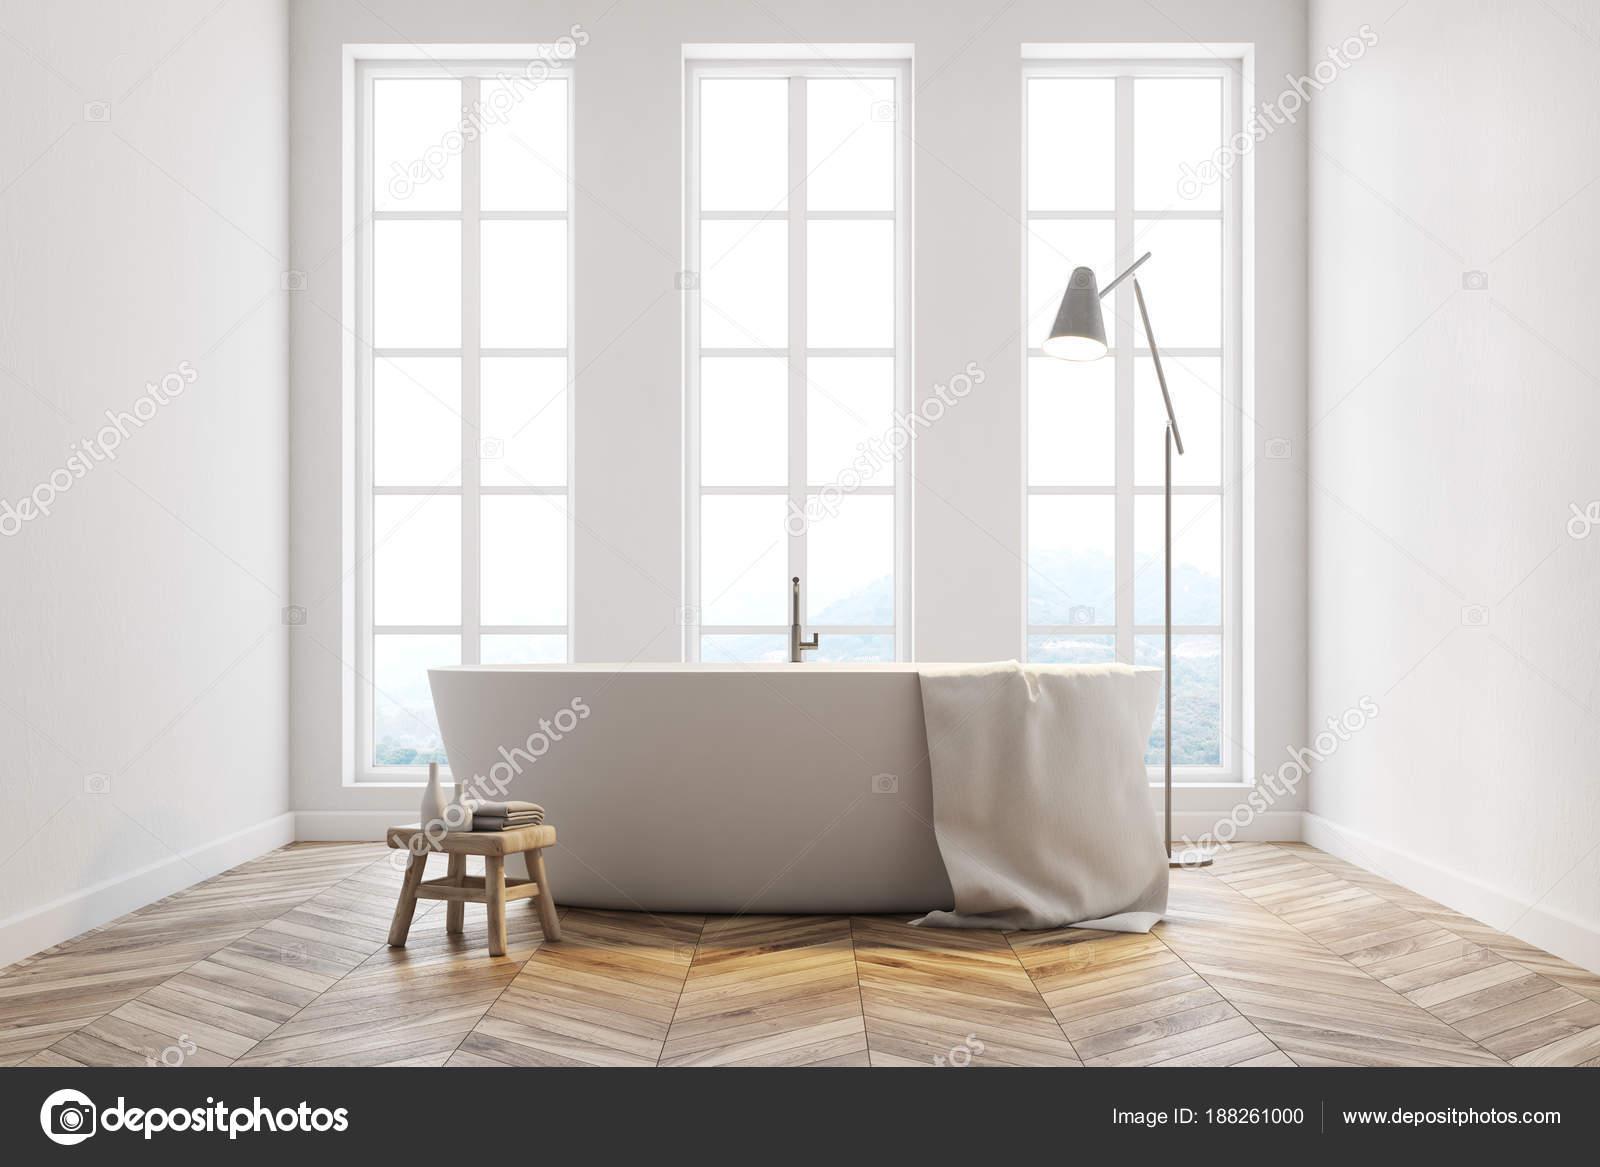 Minimalistische witte badkamer u2014 stockfoto © denisismagilov #188261000